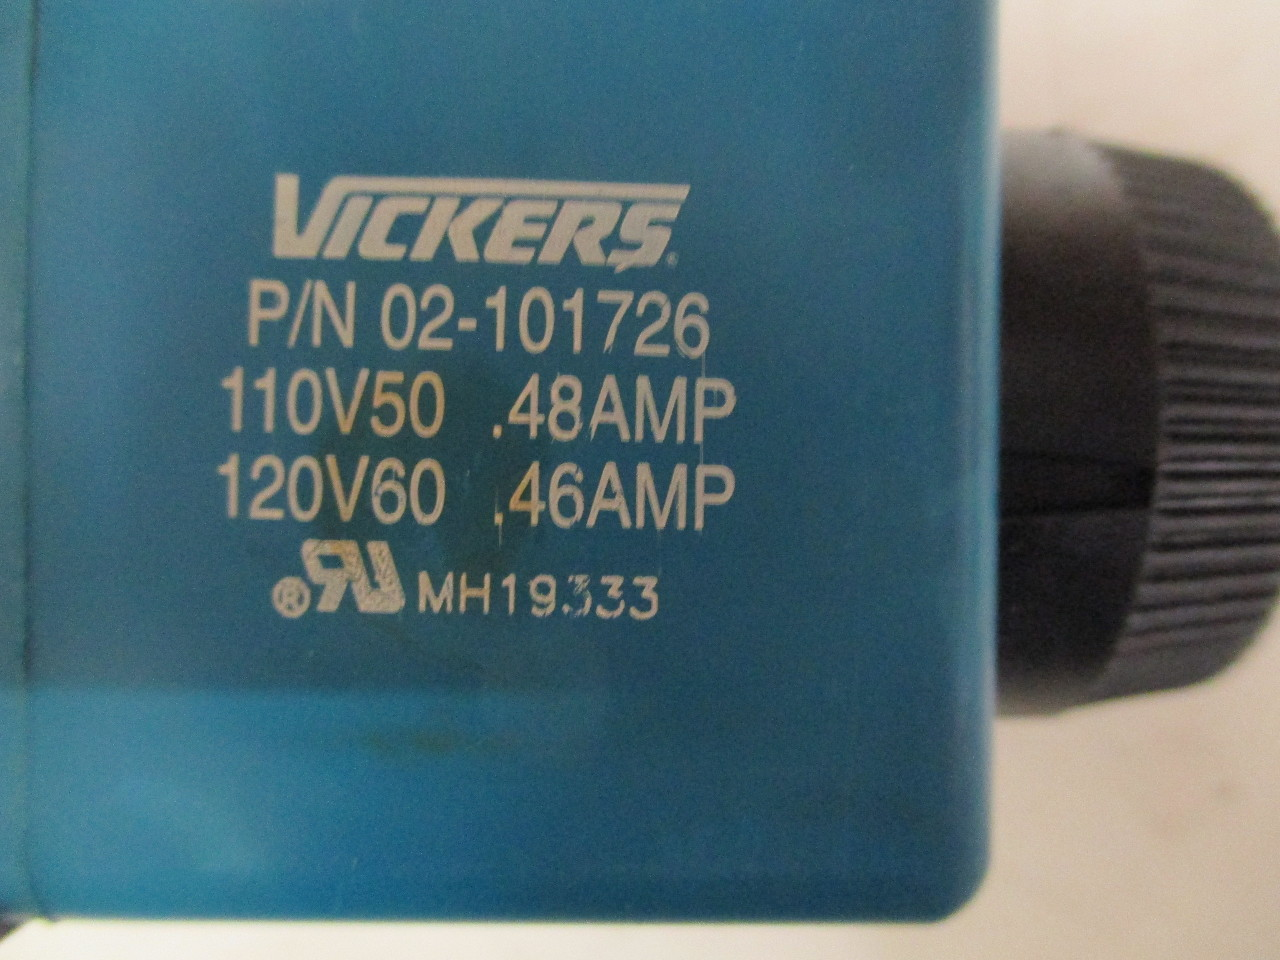 Vickers directional hydraulic control valve DG4V-3S-6C-M-U-B5-60  W/ 2 P/N 02-101726